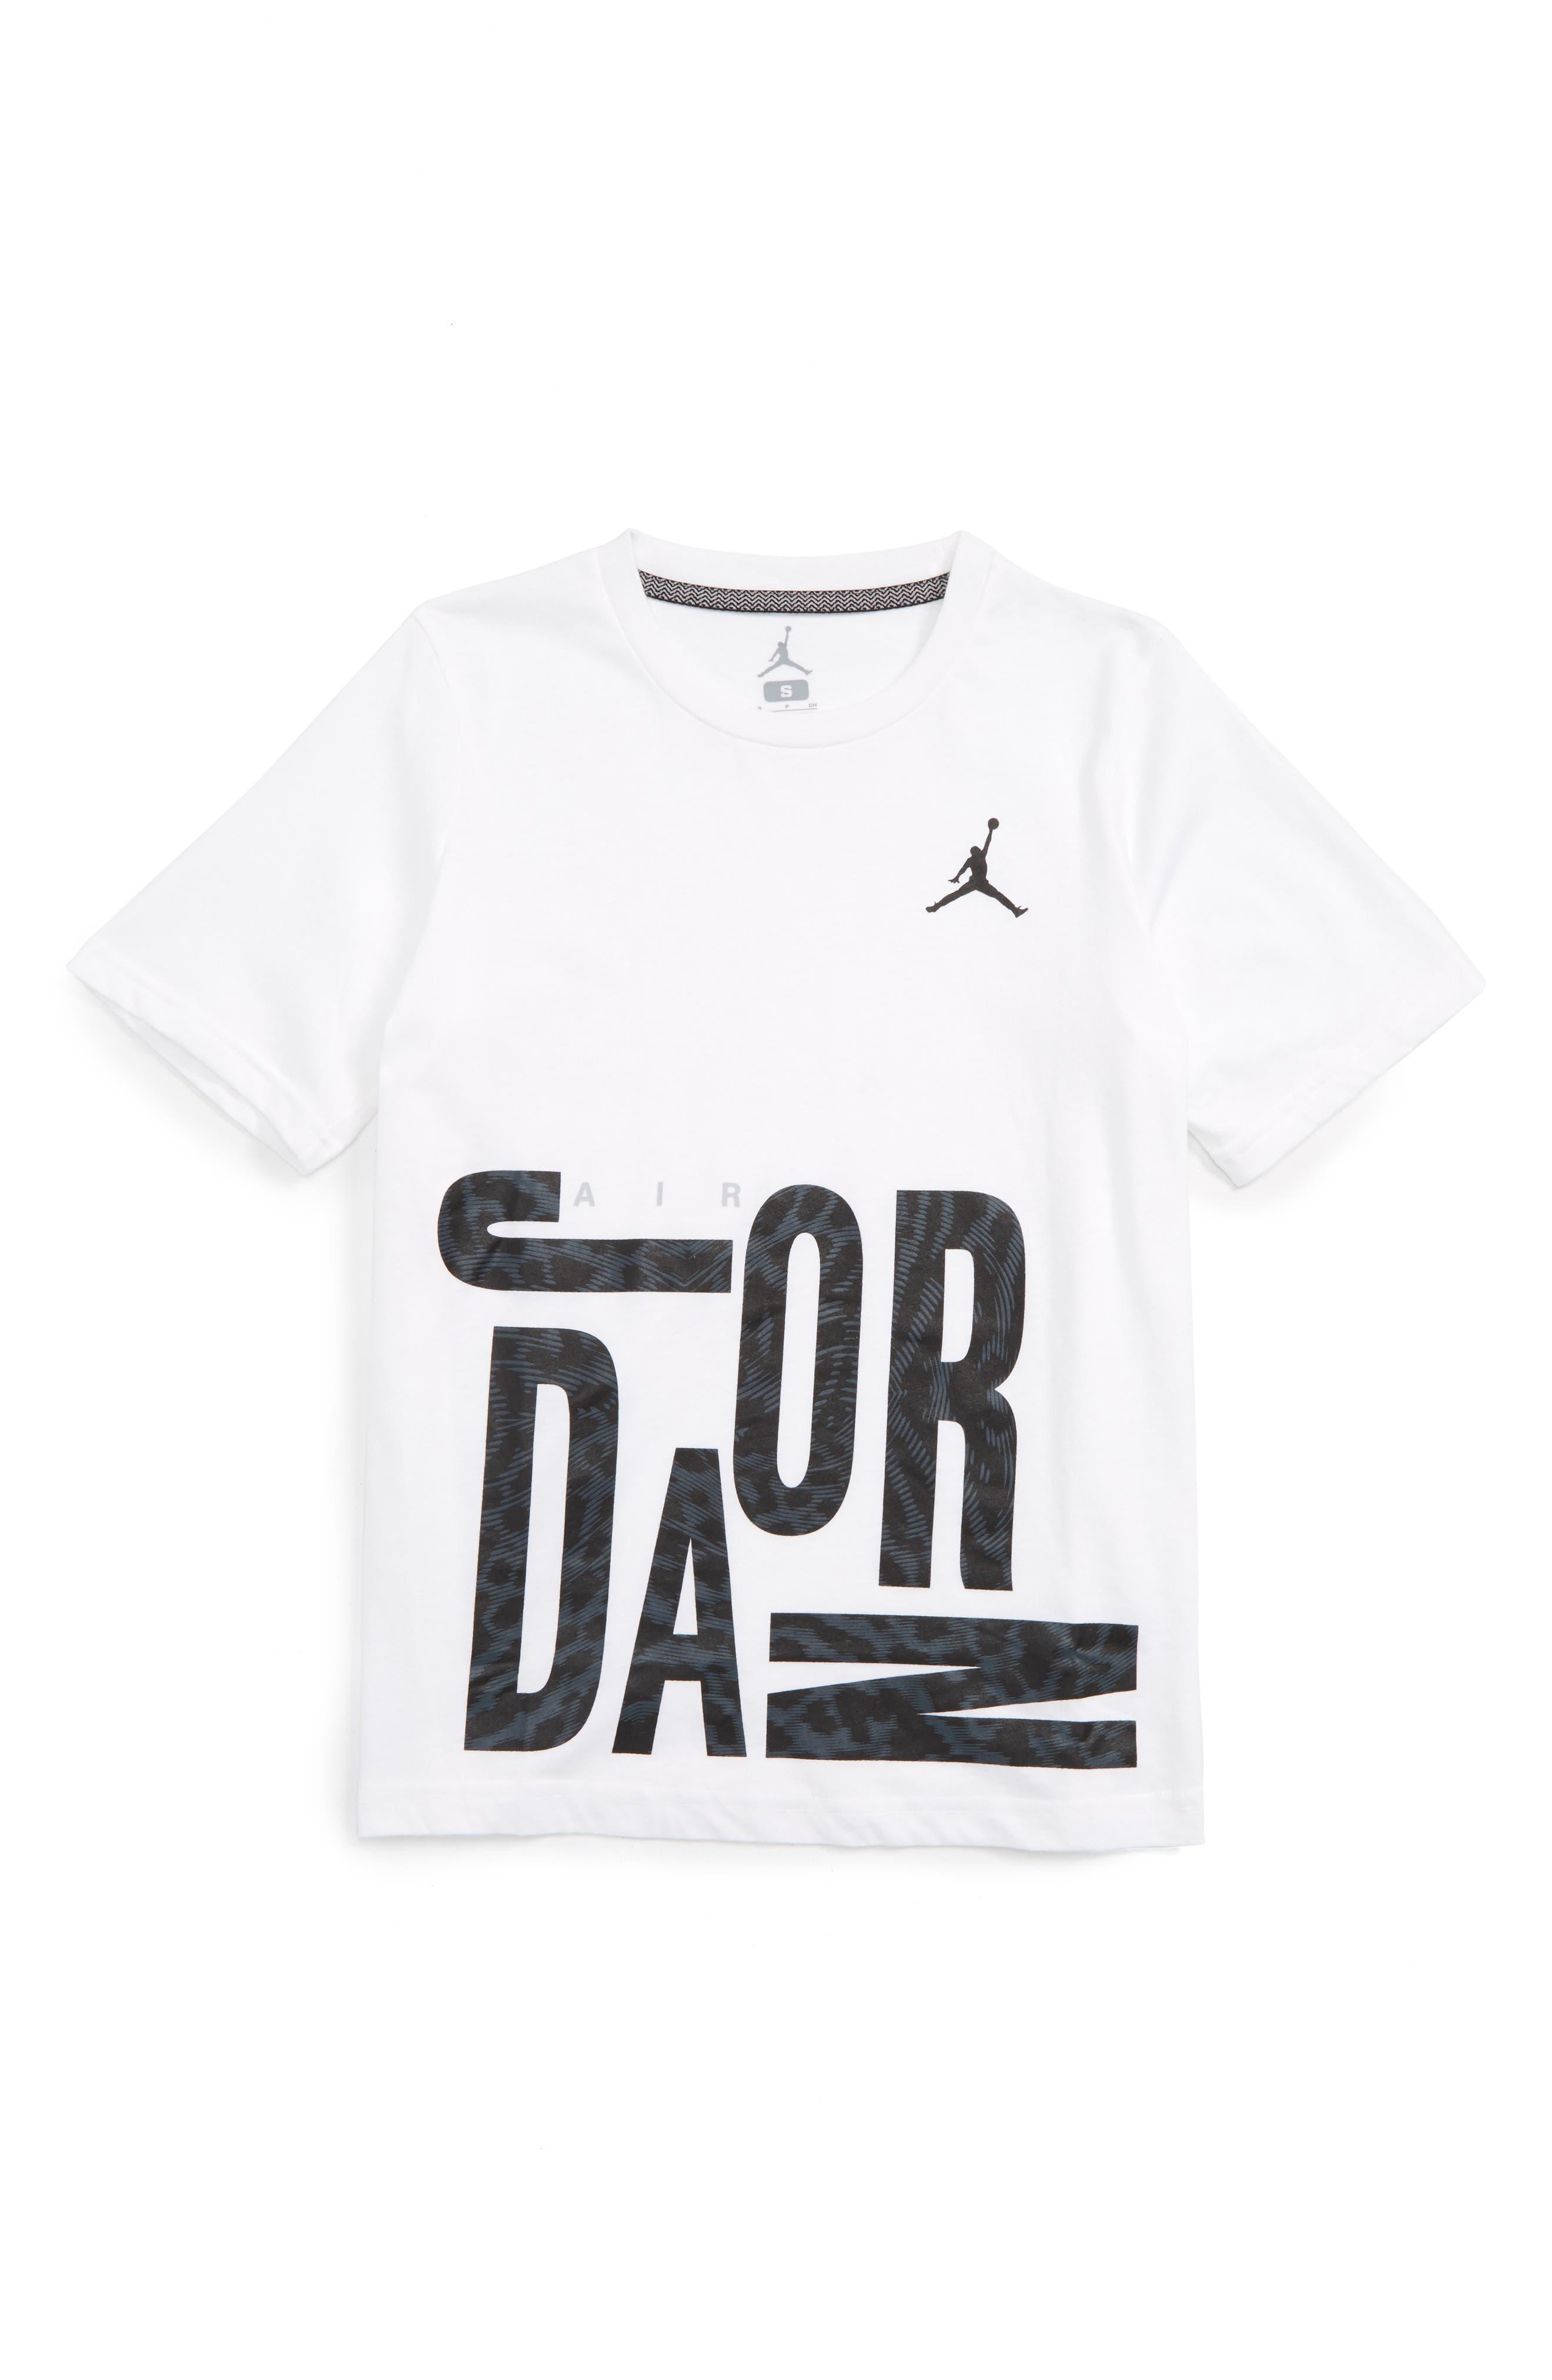 JORDAN Oversize All Shoe Graphic T-Shirt, Main, color, 100